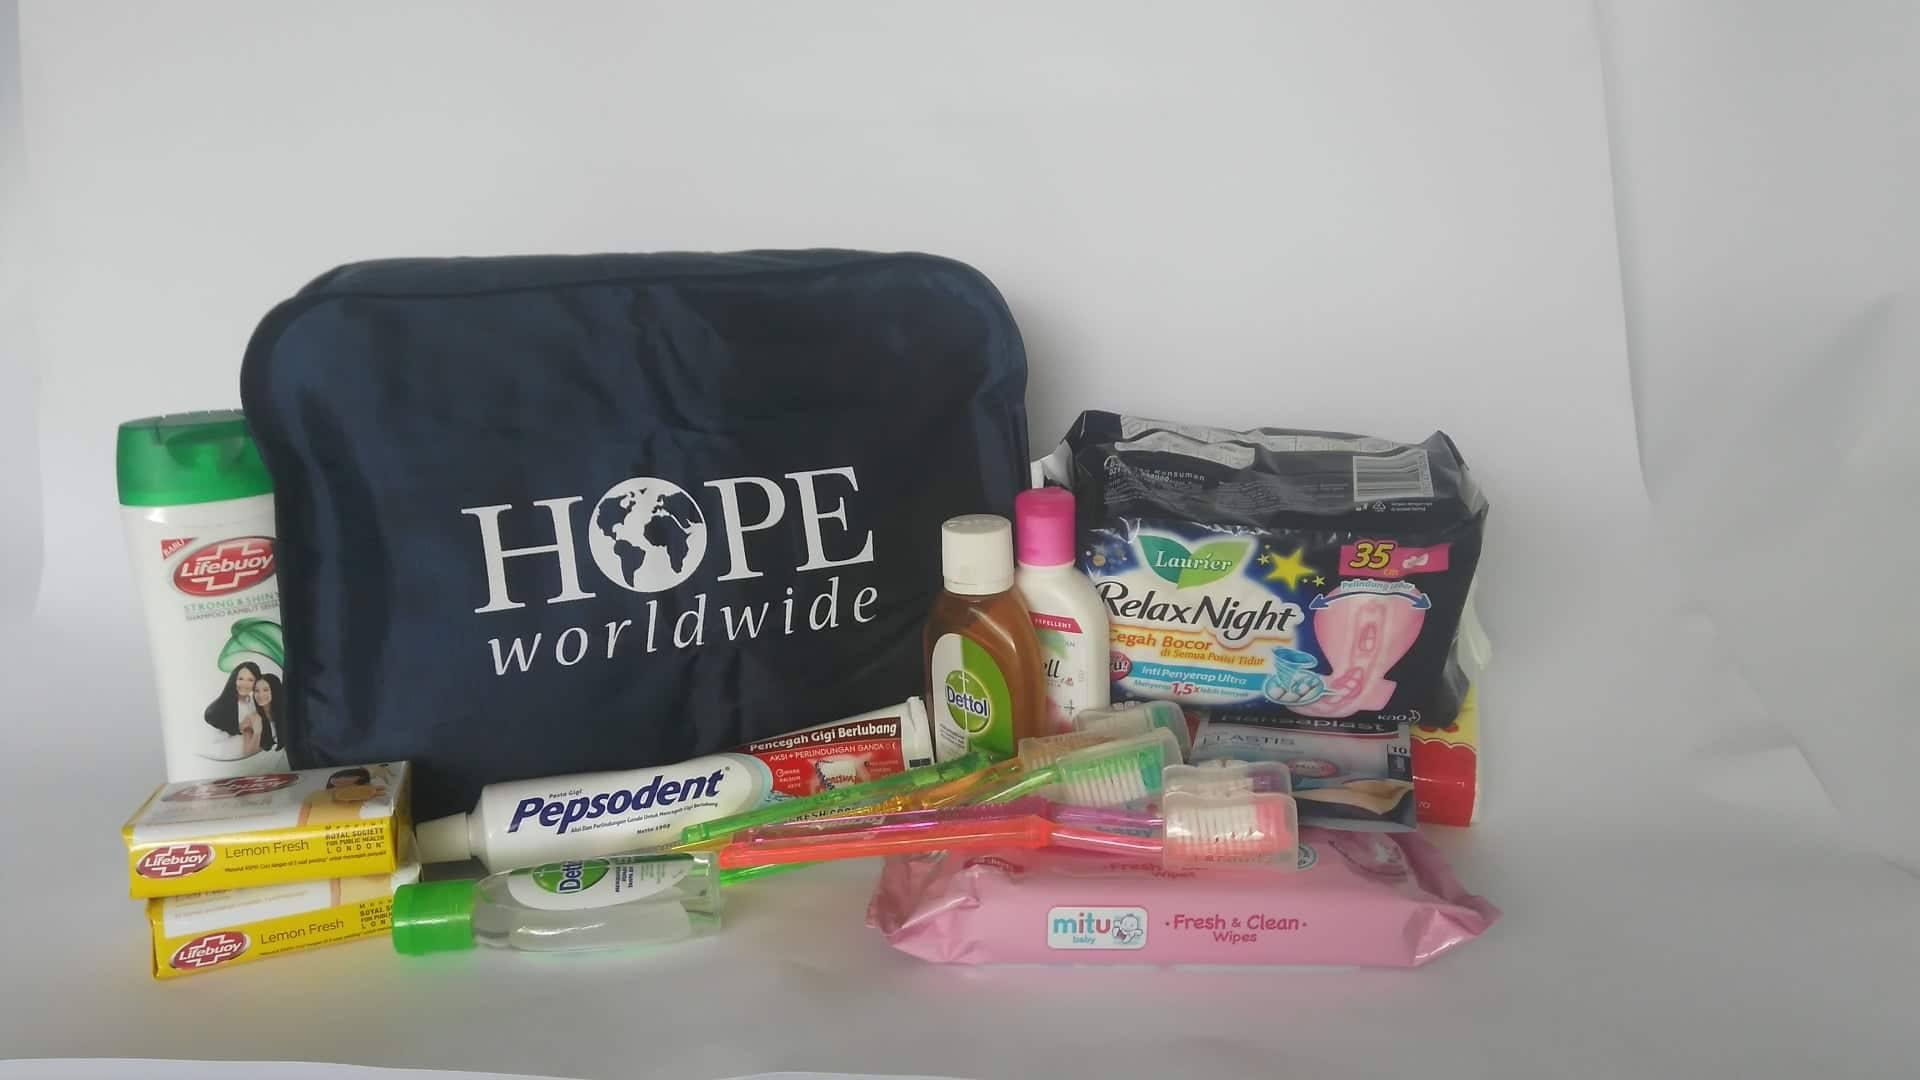 Hygiene kit (for a man): Shampoo Softsoap Men's razor Shaving cream Toothbrush Toothpaste Towel Deodorant Mouthwash Brush or comb Large printed Ziploc bag